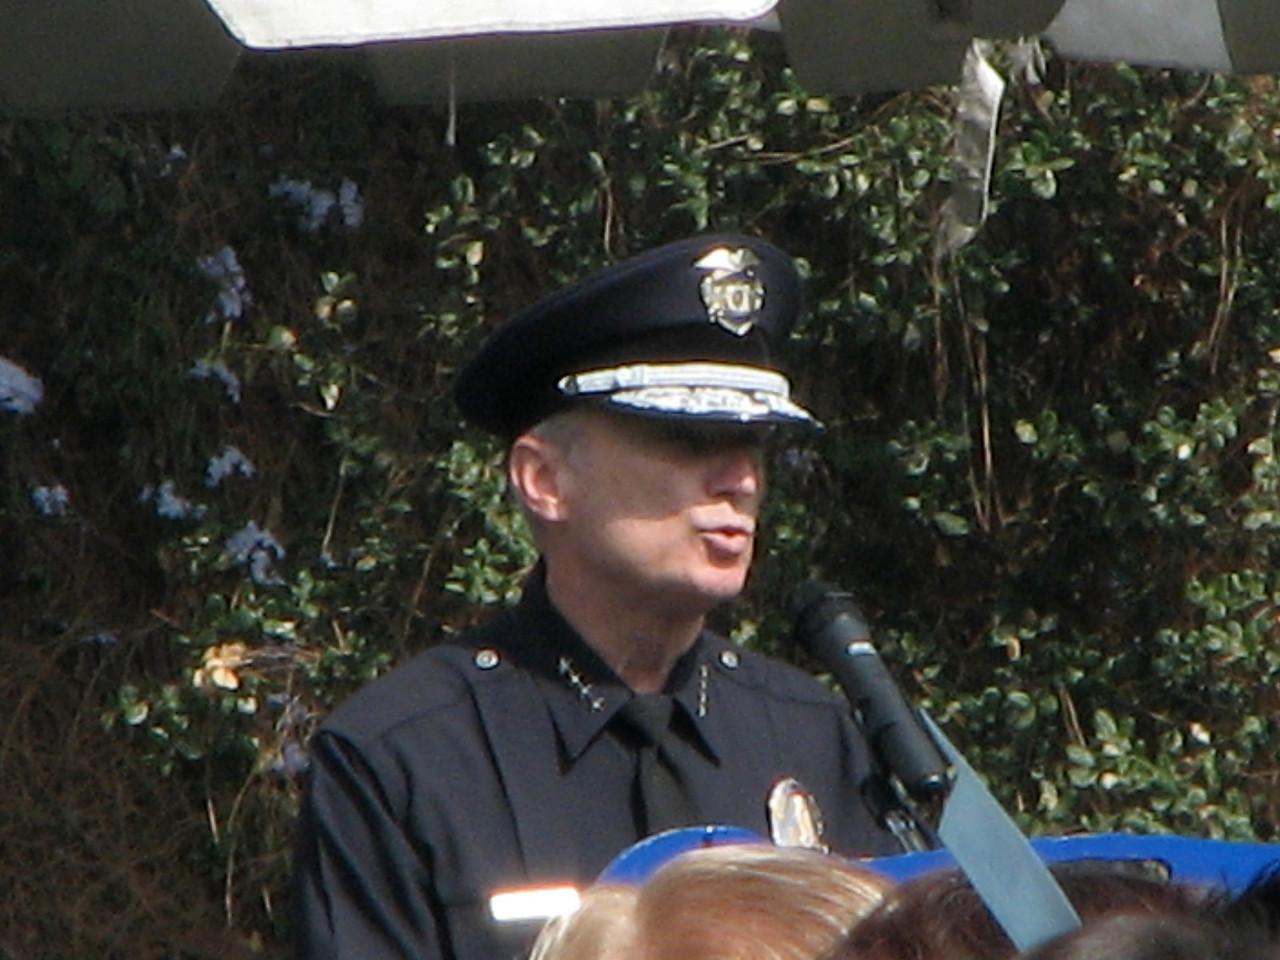 2007 05 25 Fri - LAPD Police Chief speech close up